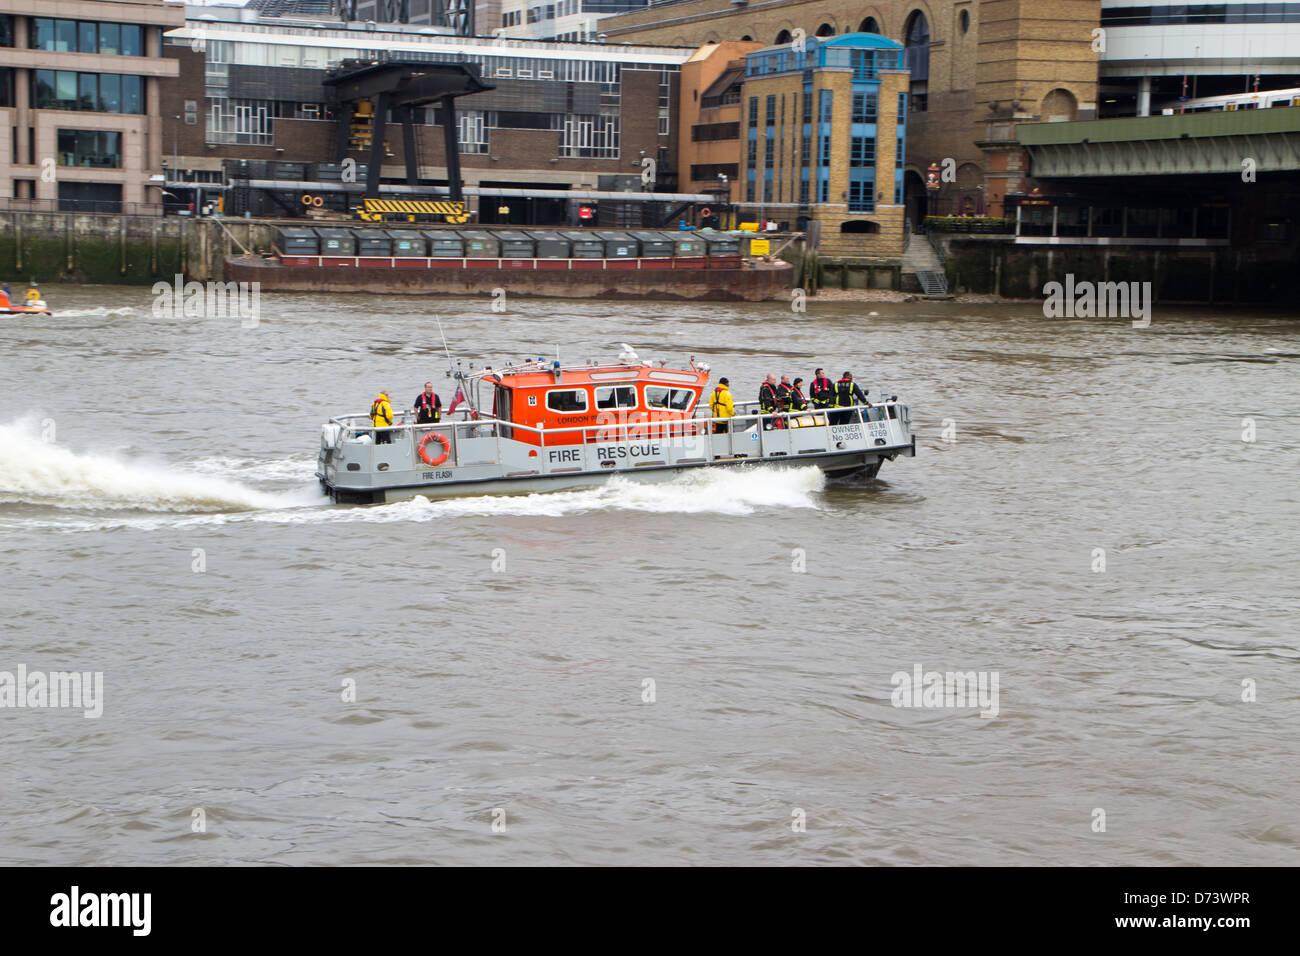 London fire brigade boat - Stock Image